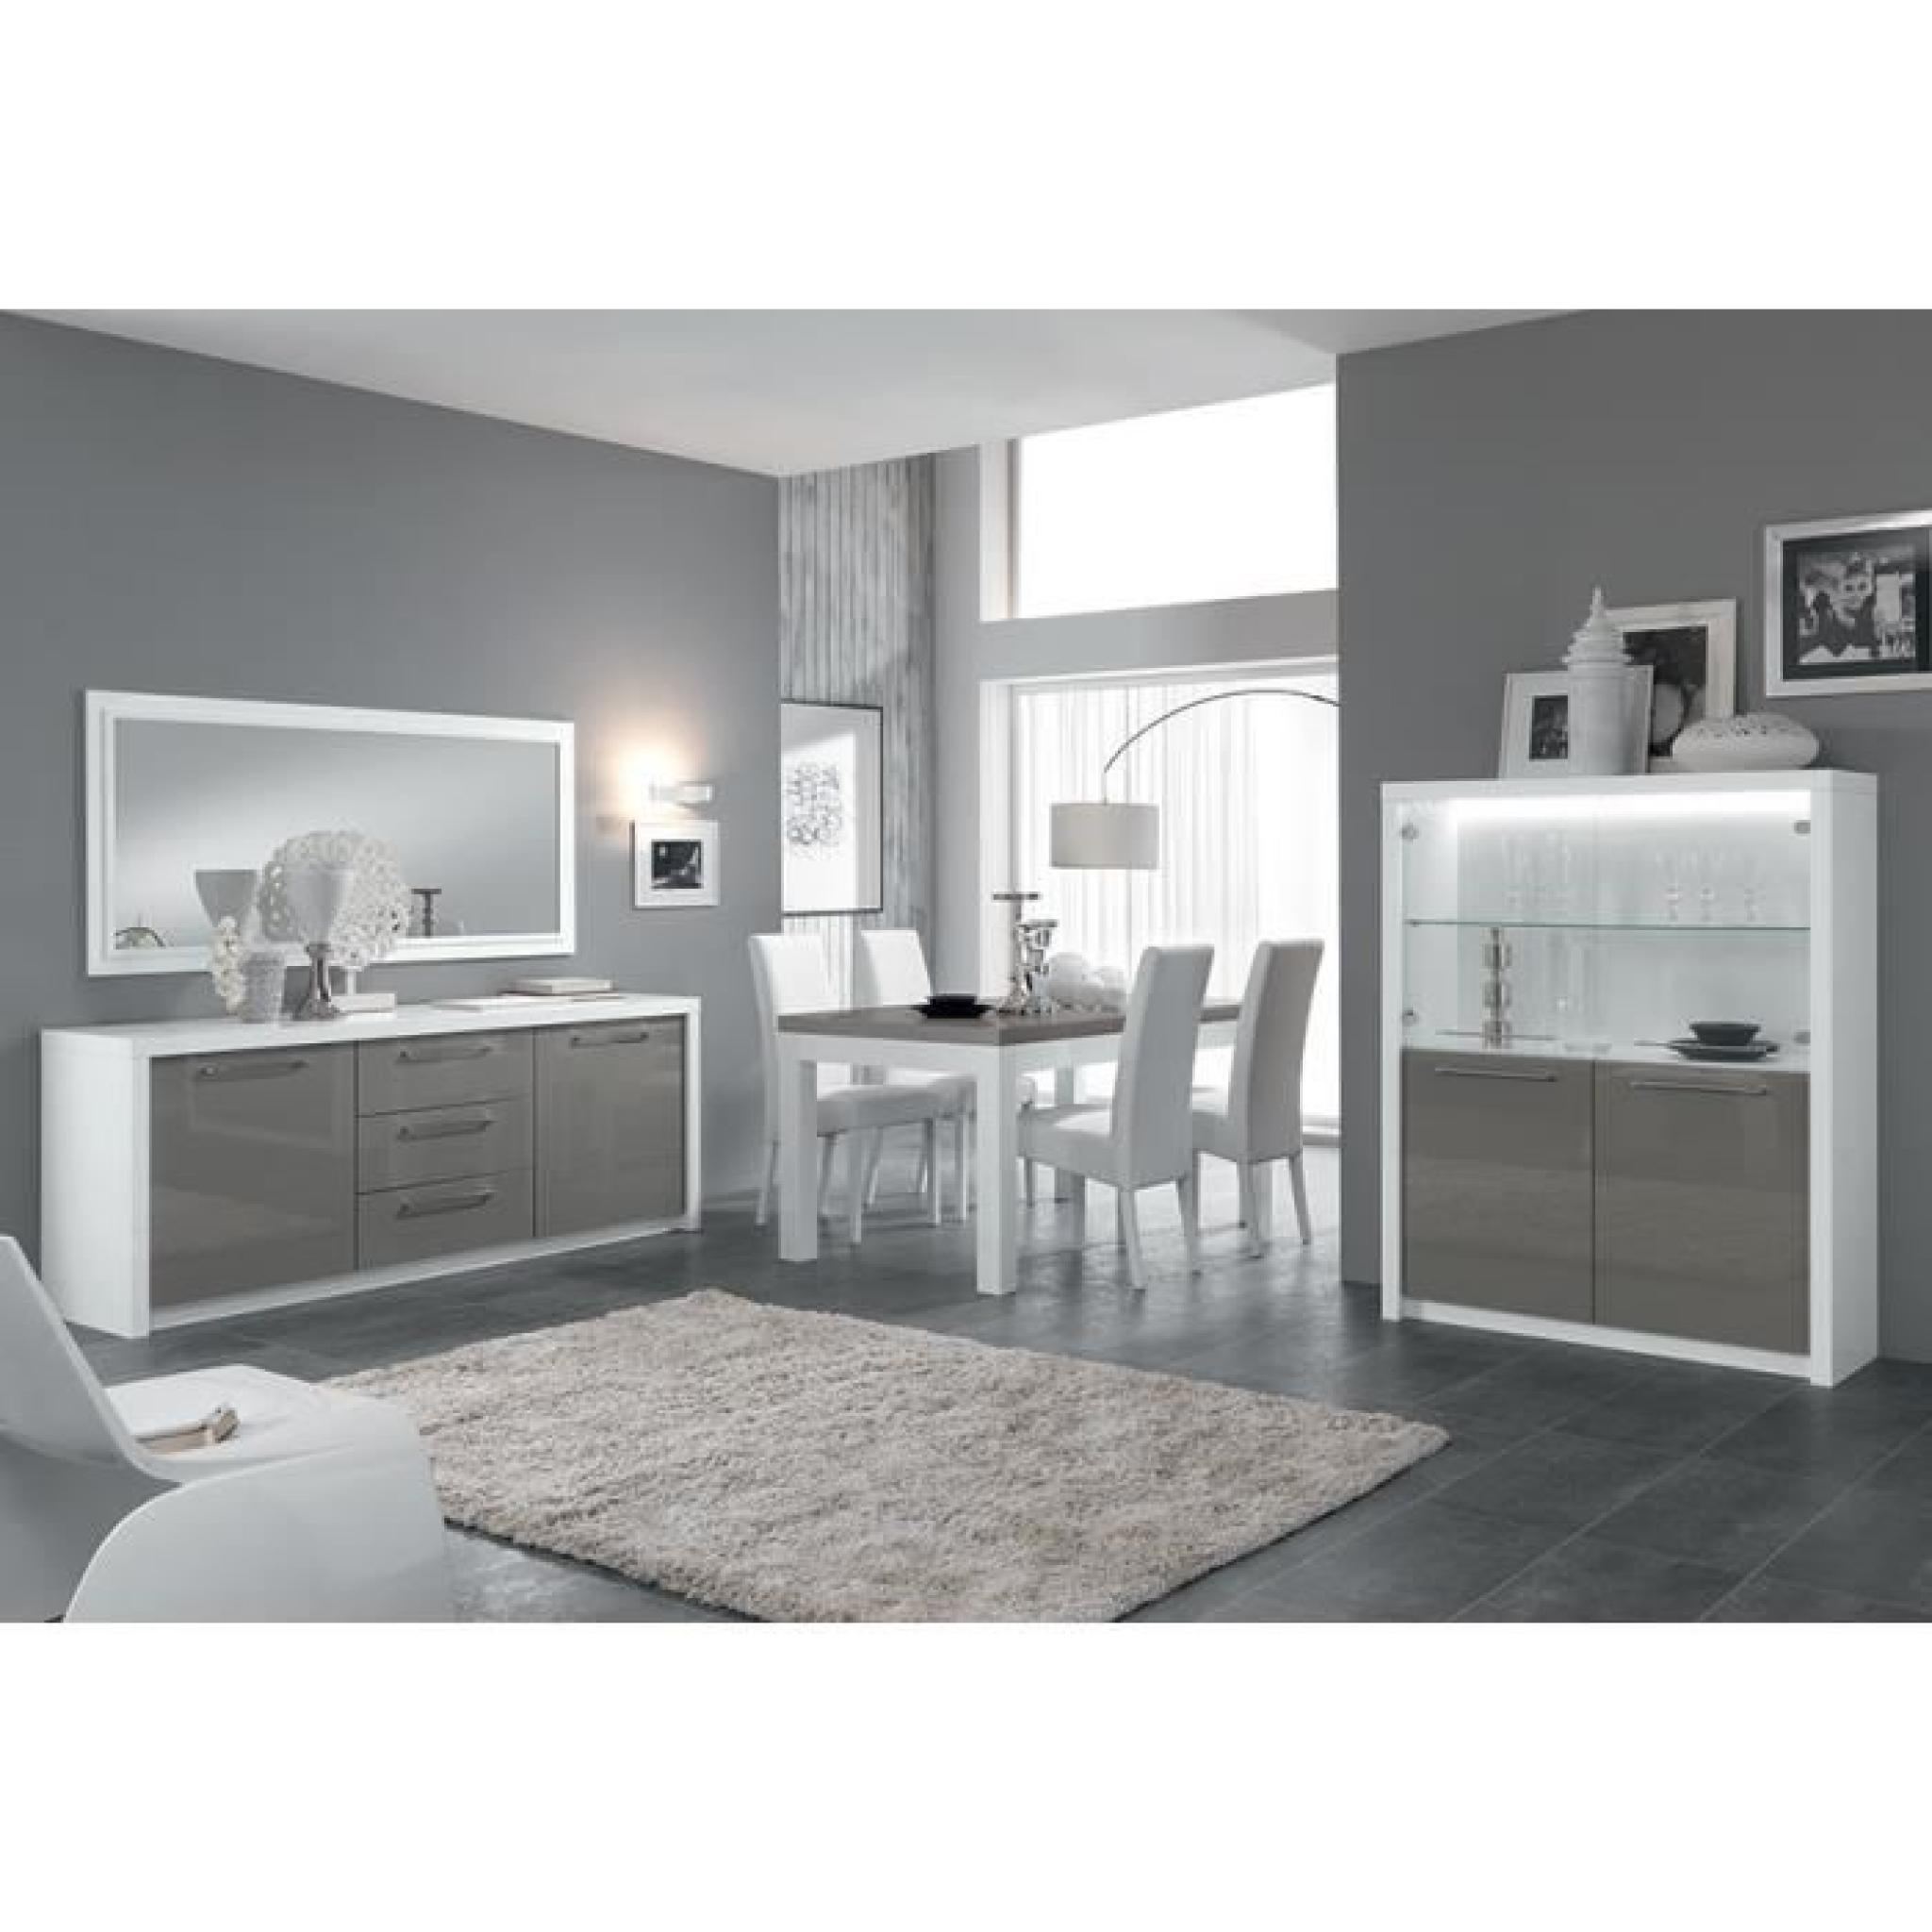 salle manger compl te blanc et gris laqu design lydia l. Black Bedroom Furniture Sets. Home Design Ideas